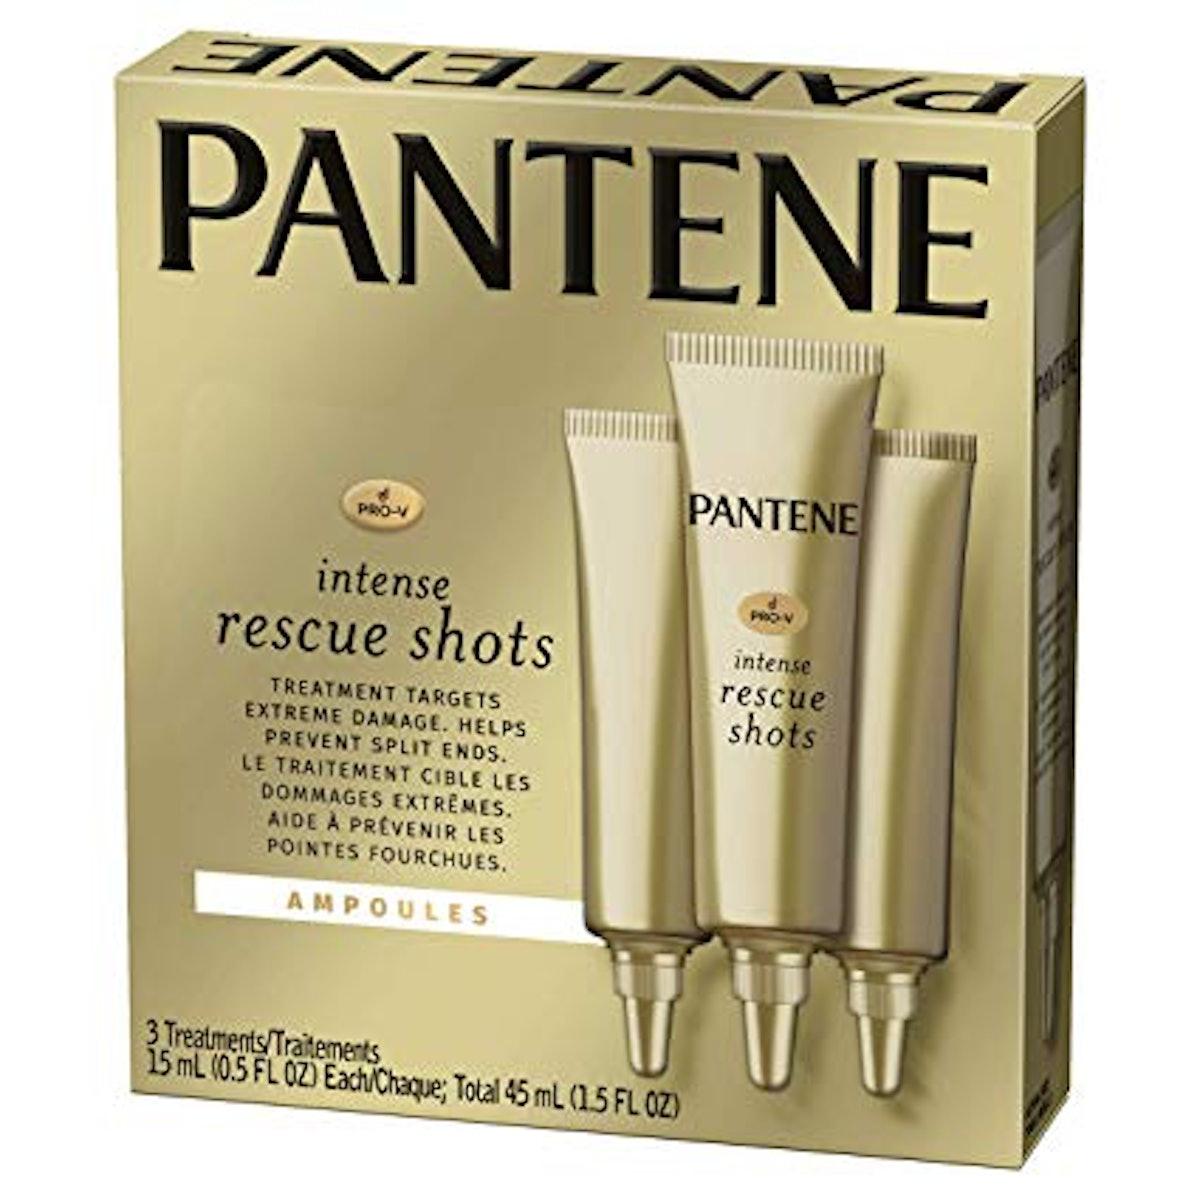 Pantene Intense Rescue Shots (3 Treatments)